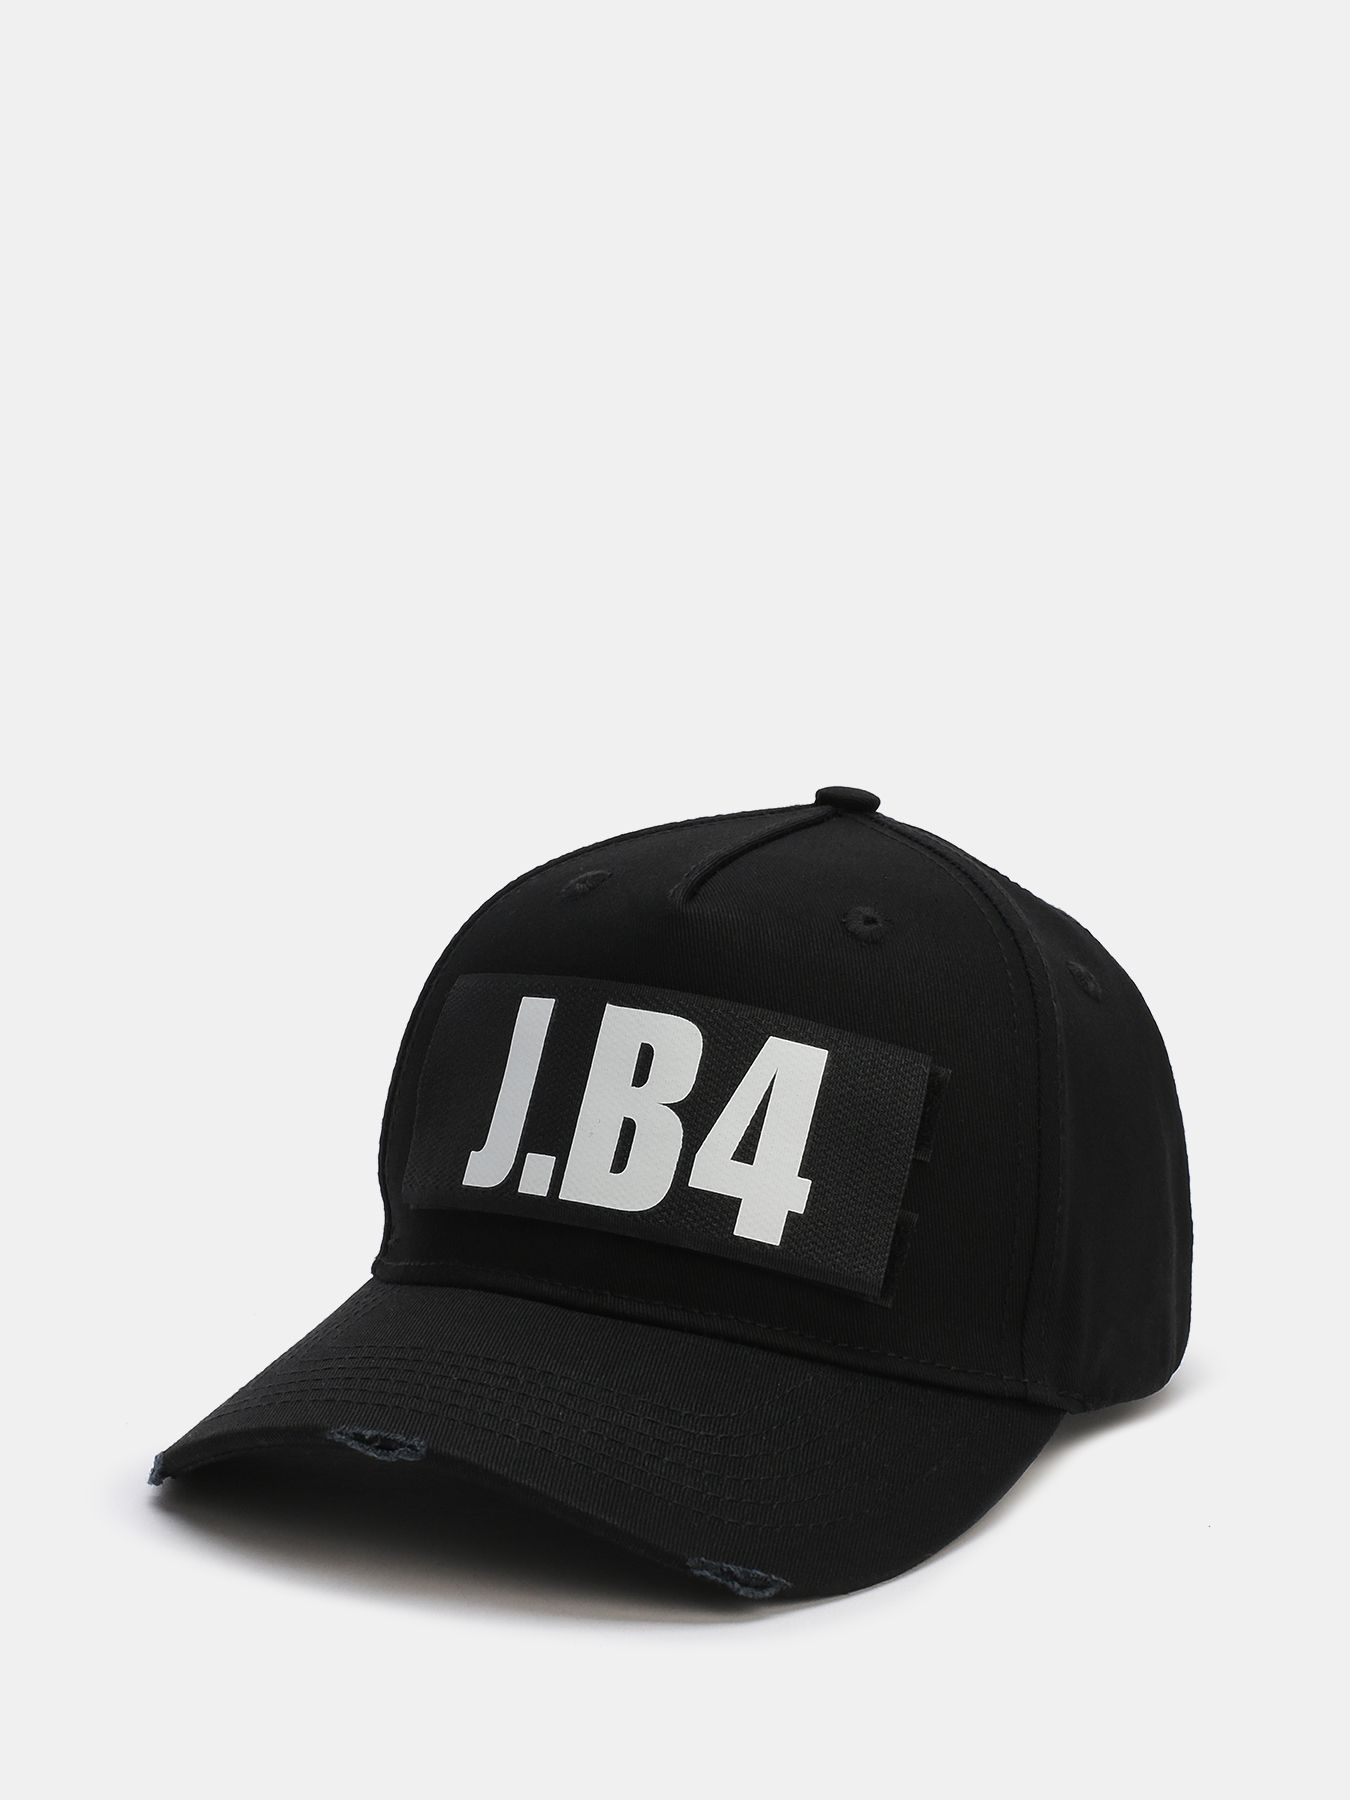 Бейсболки J.B4 Бейсболка